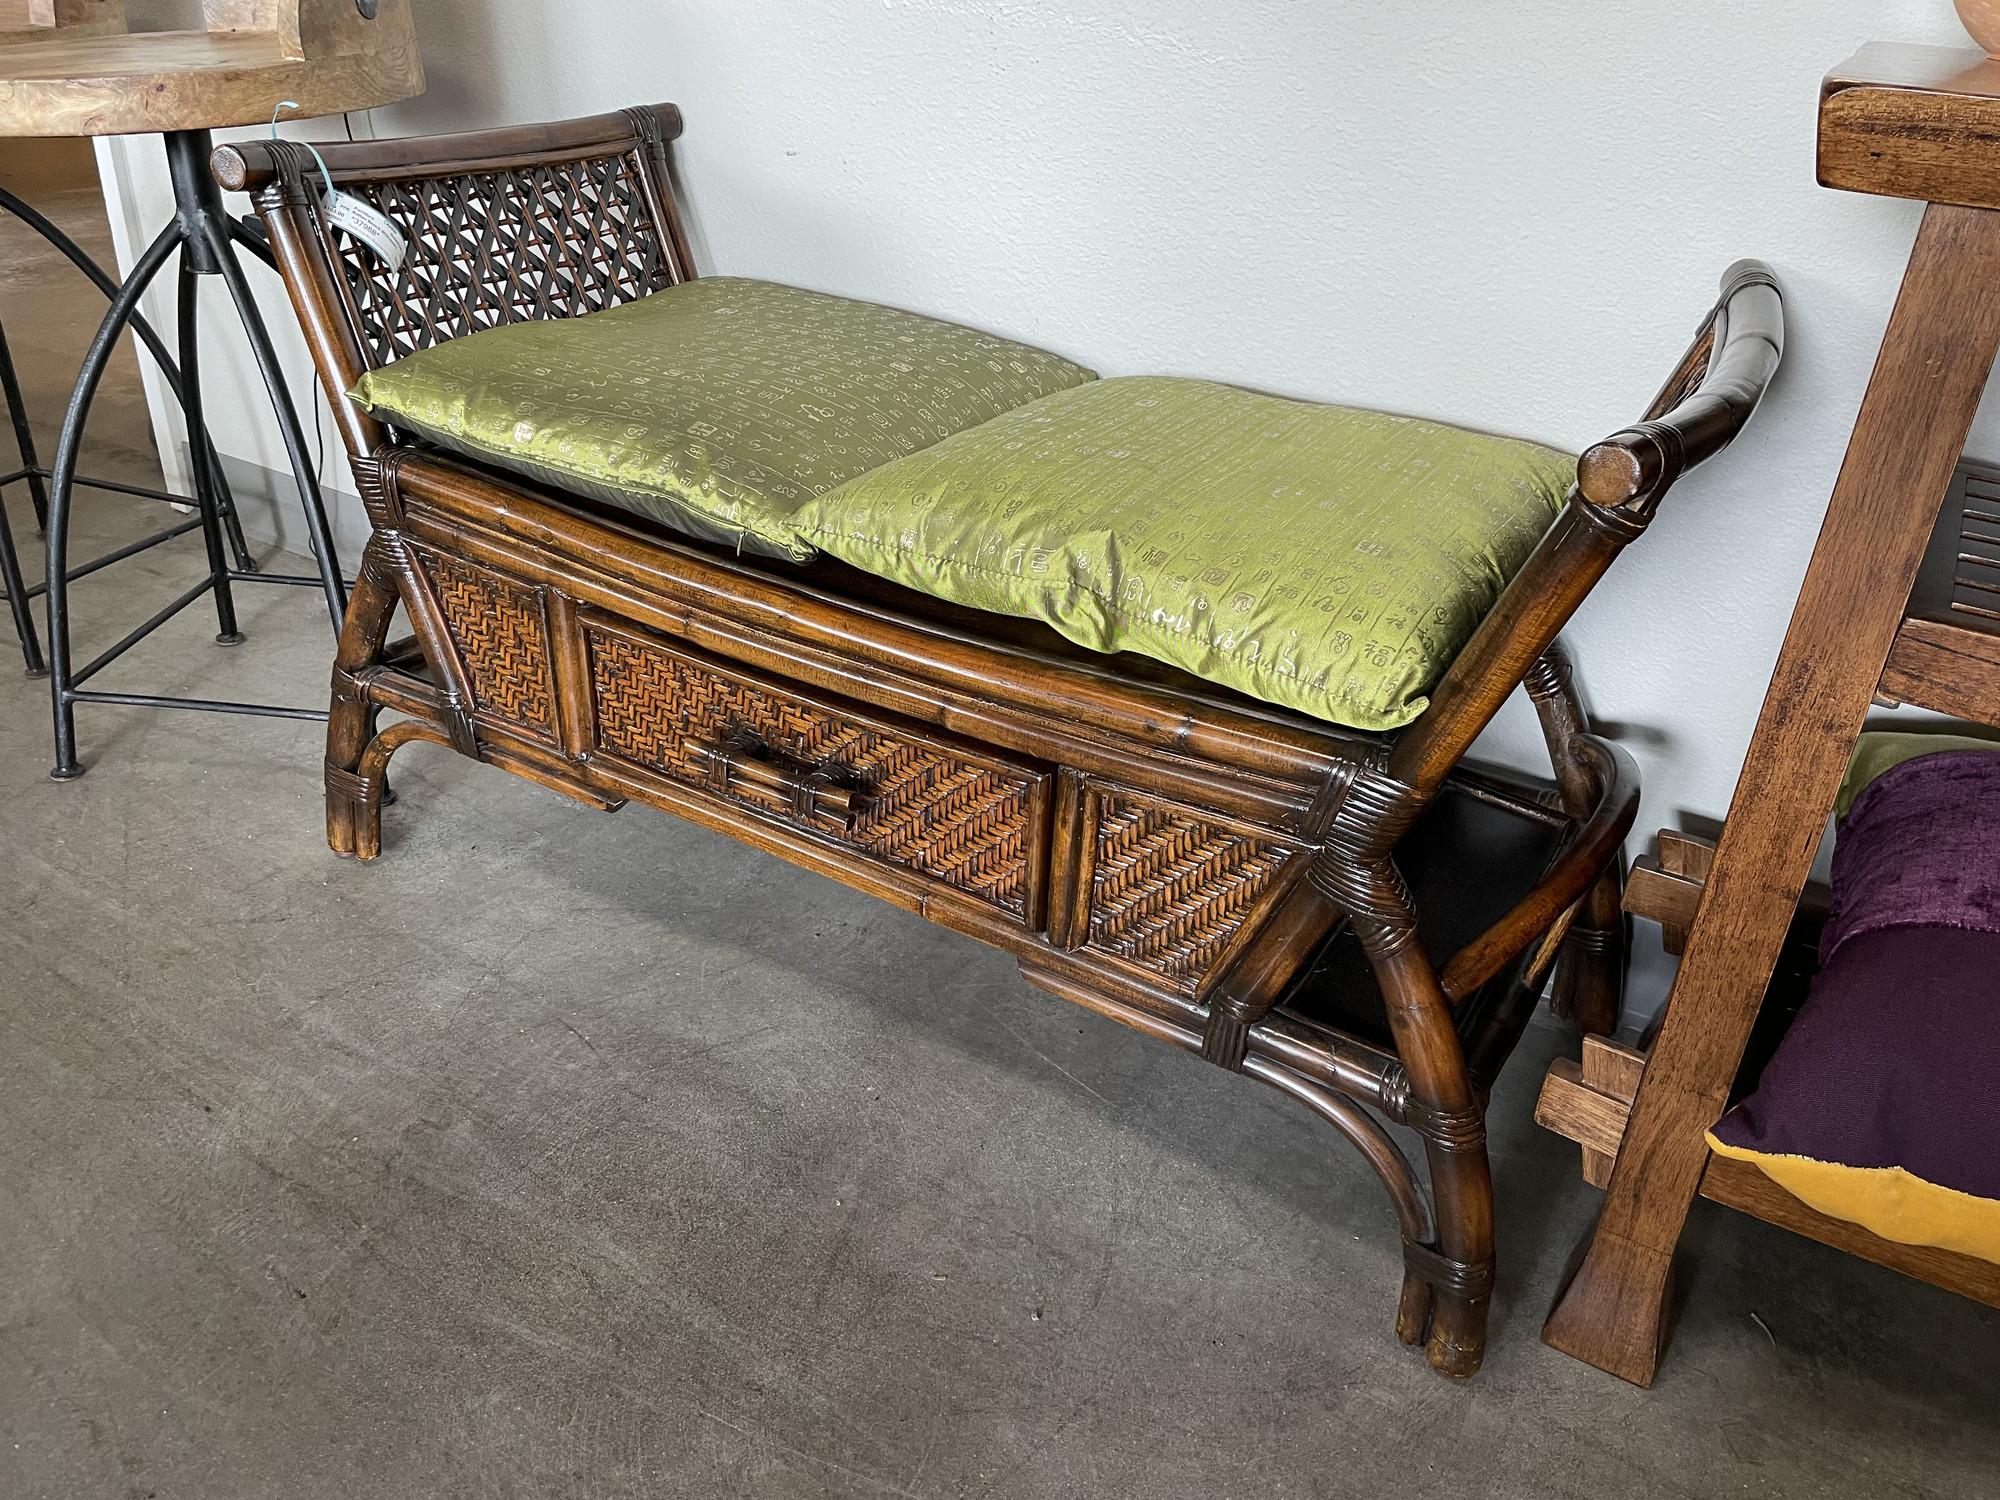 Rattan Bench W/Drawers, GreenCus, Size: 40.18.18